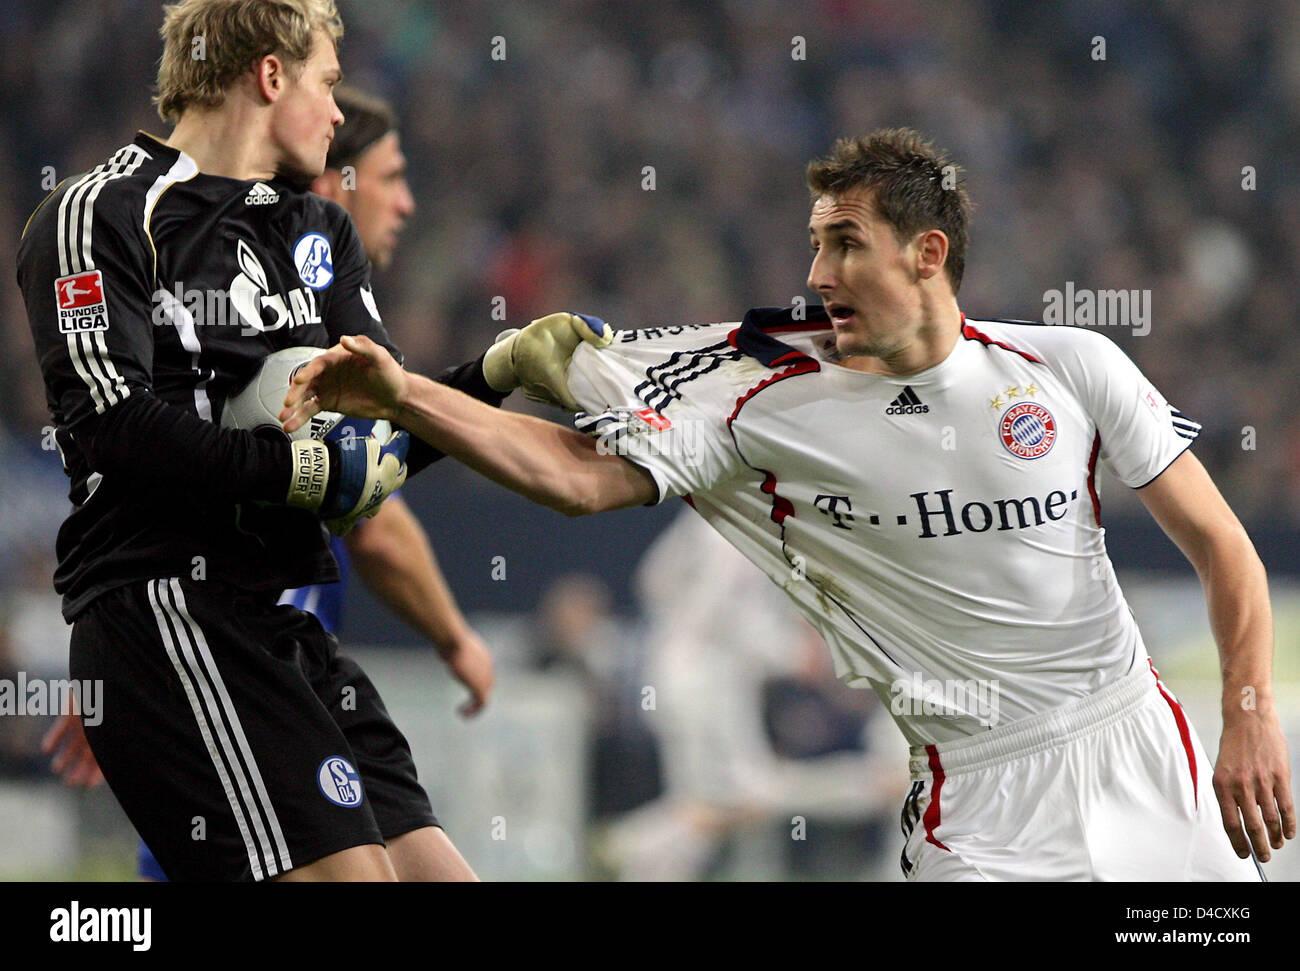 promo code 220bf 055fc Schalke's goalkeeper Manuel Neuer pulls the jersey of ...